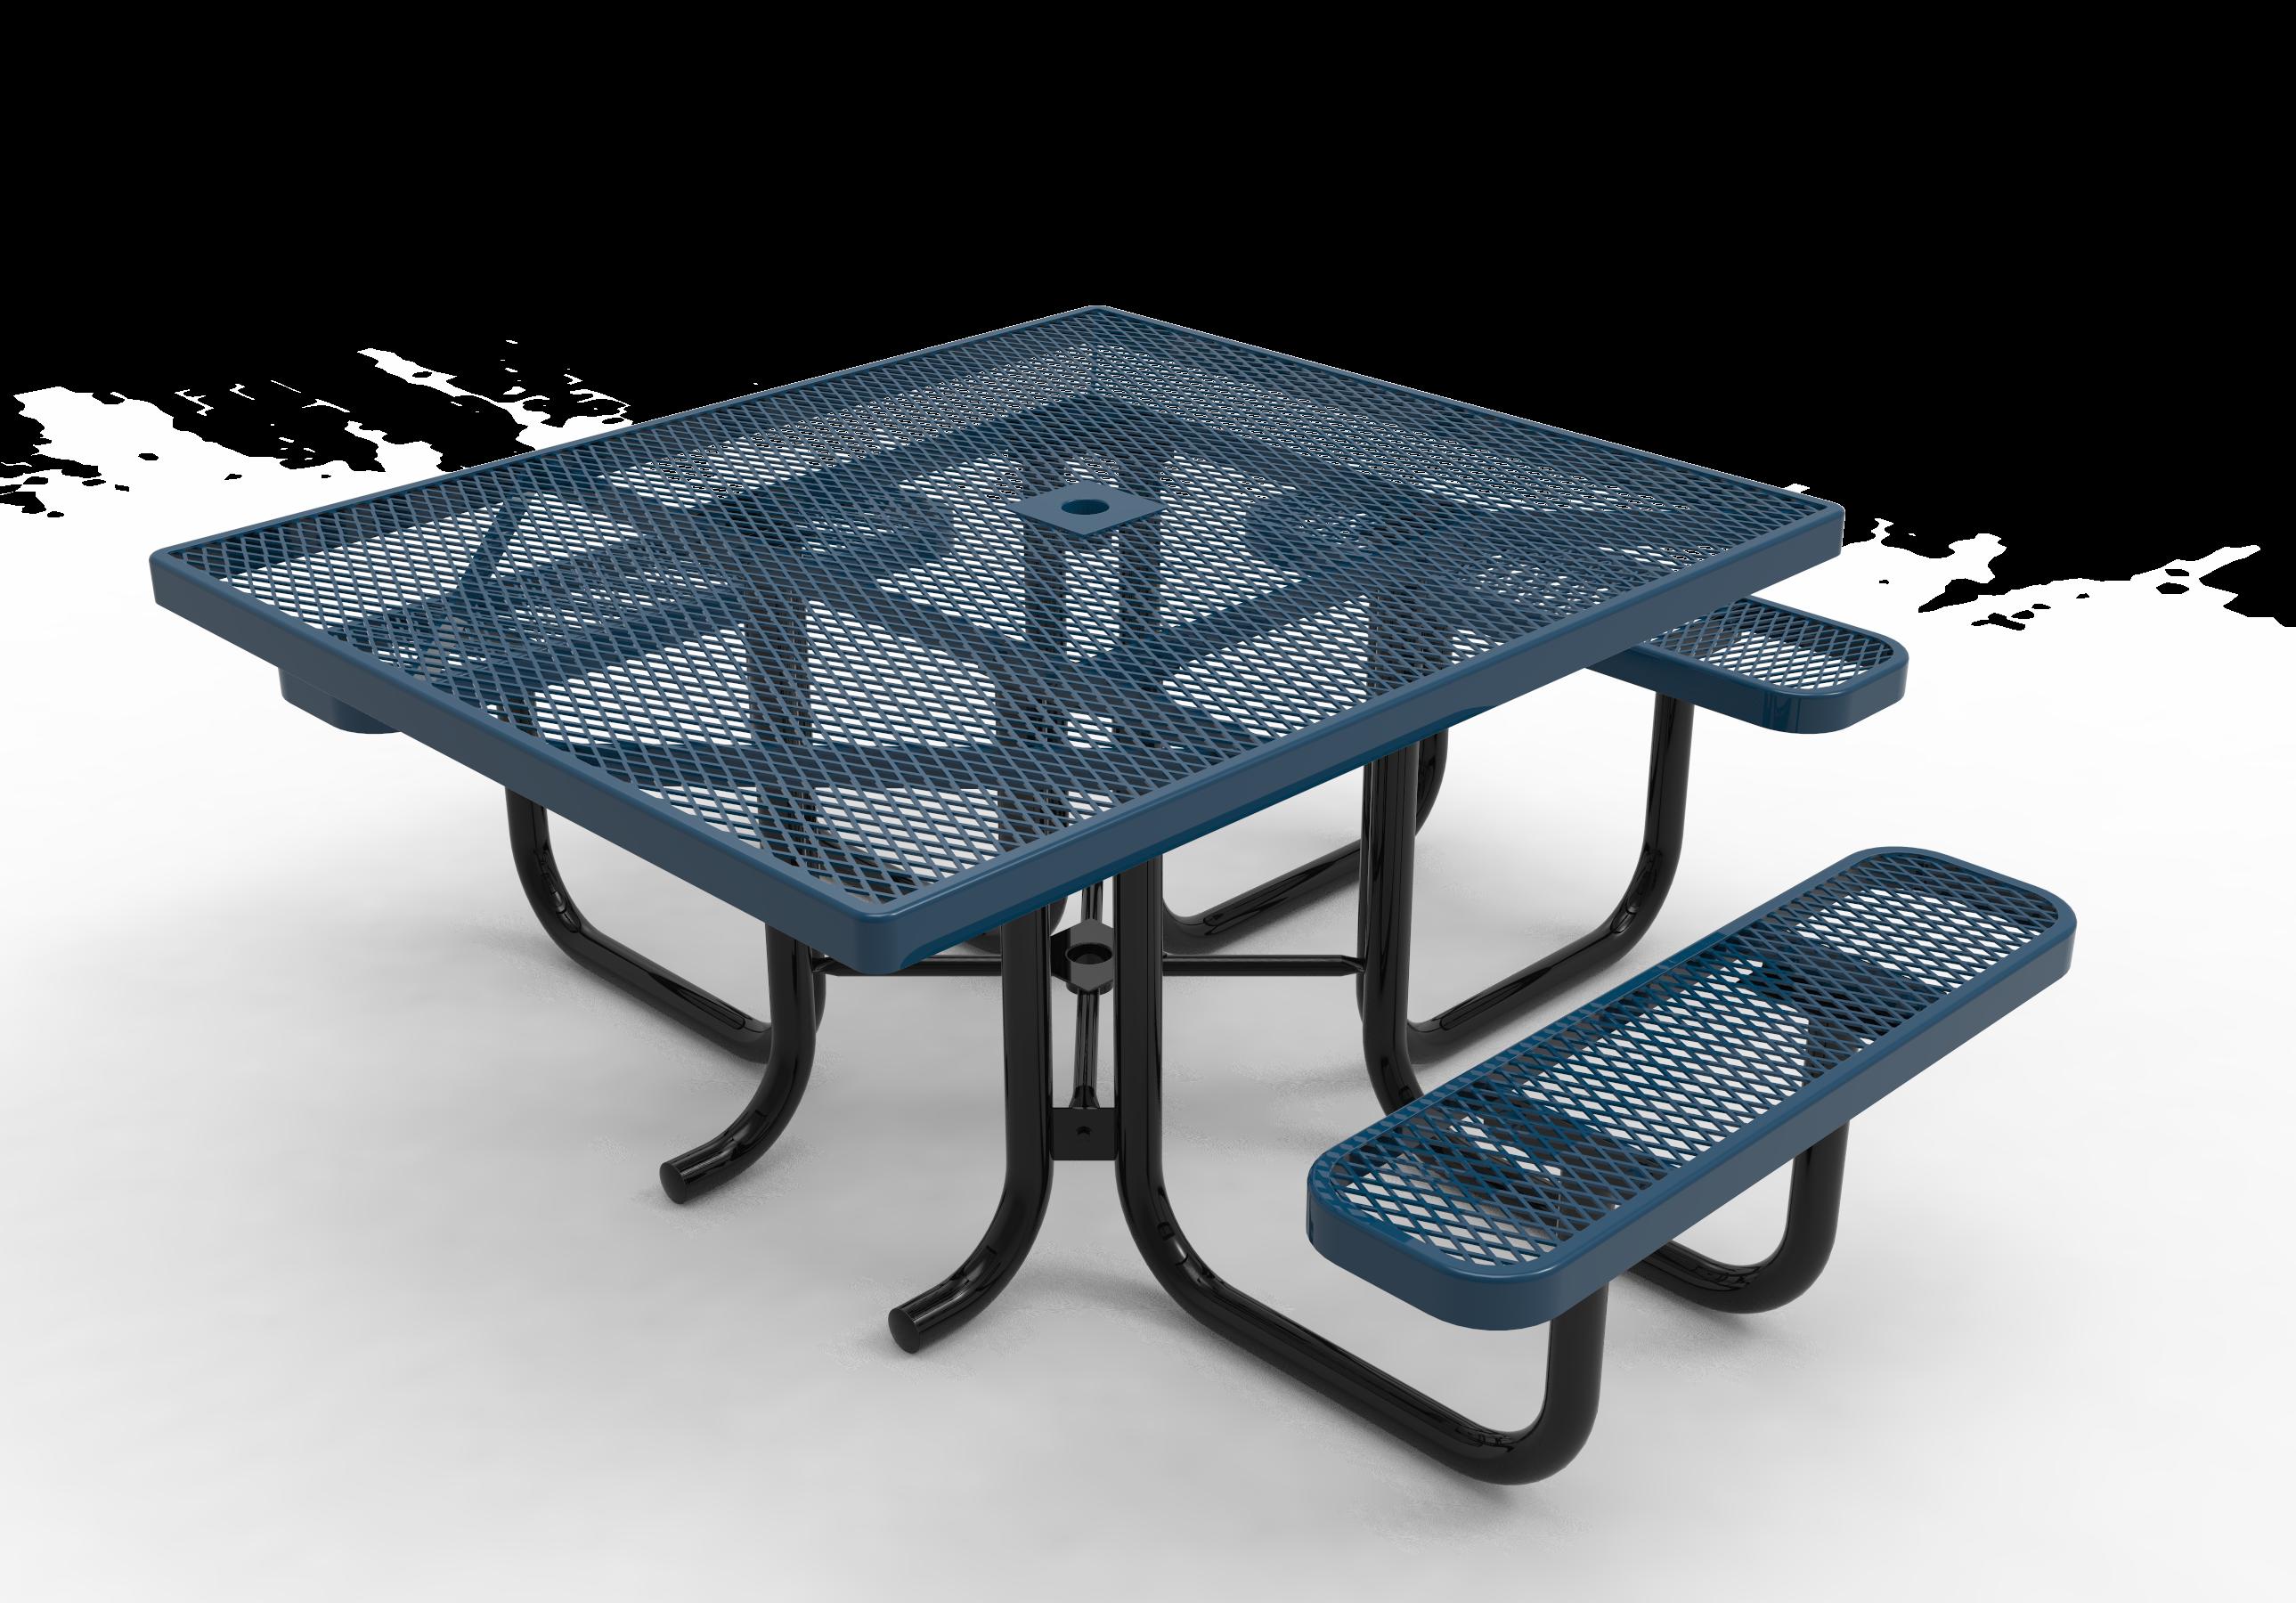 46-in. Square ADA Picnic Table